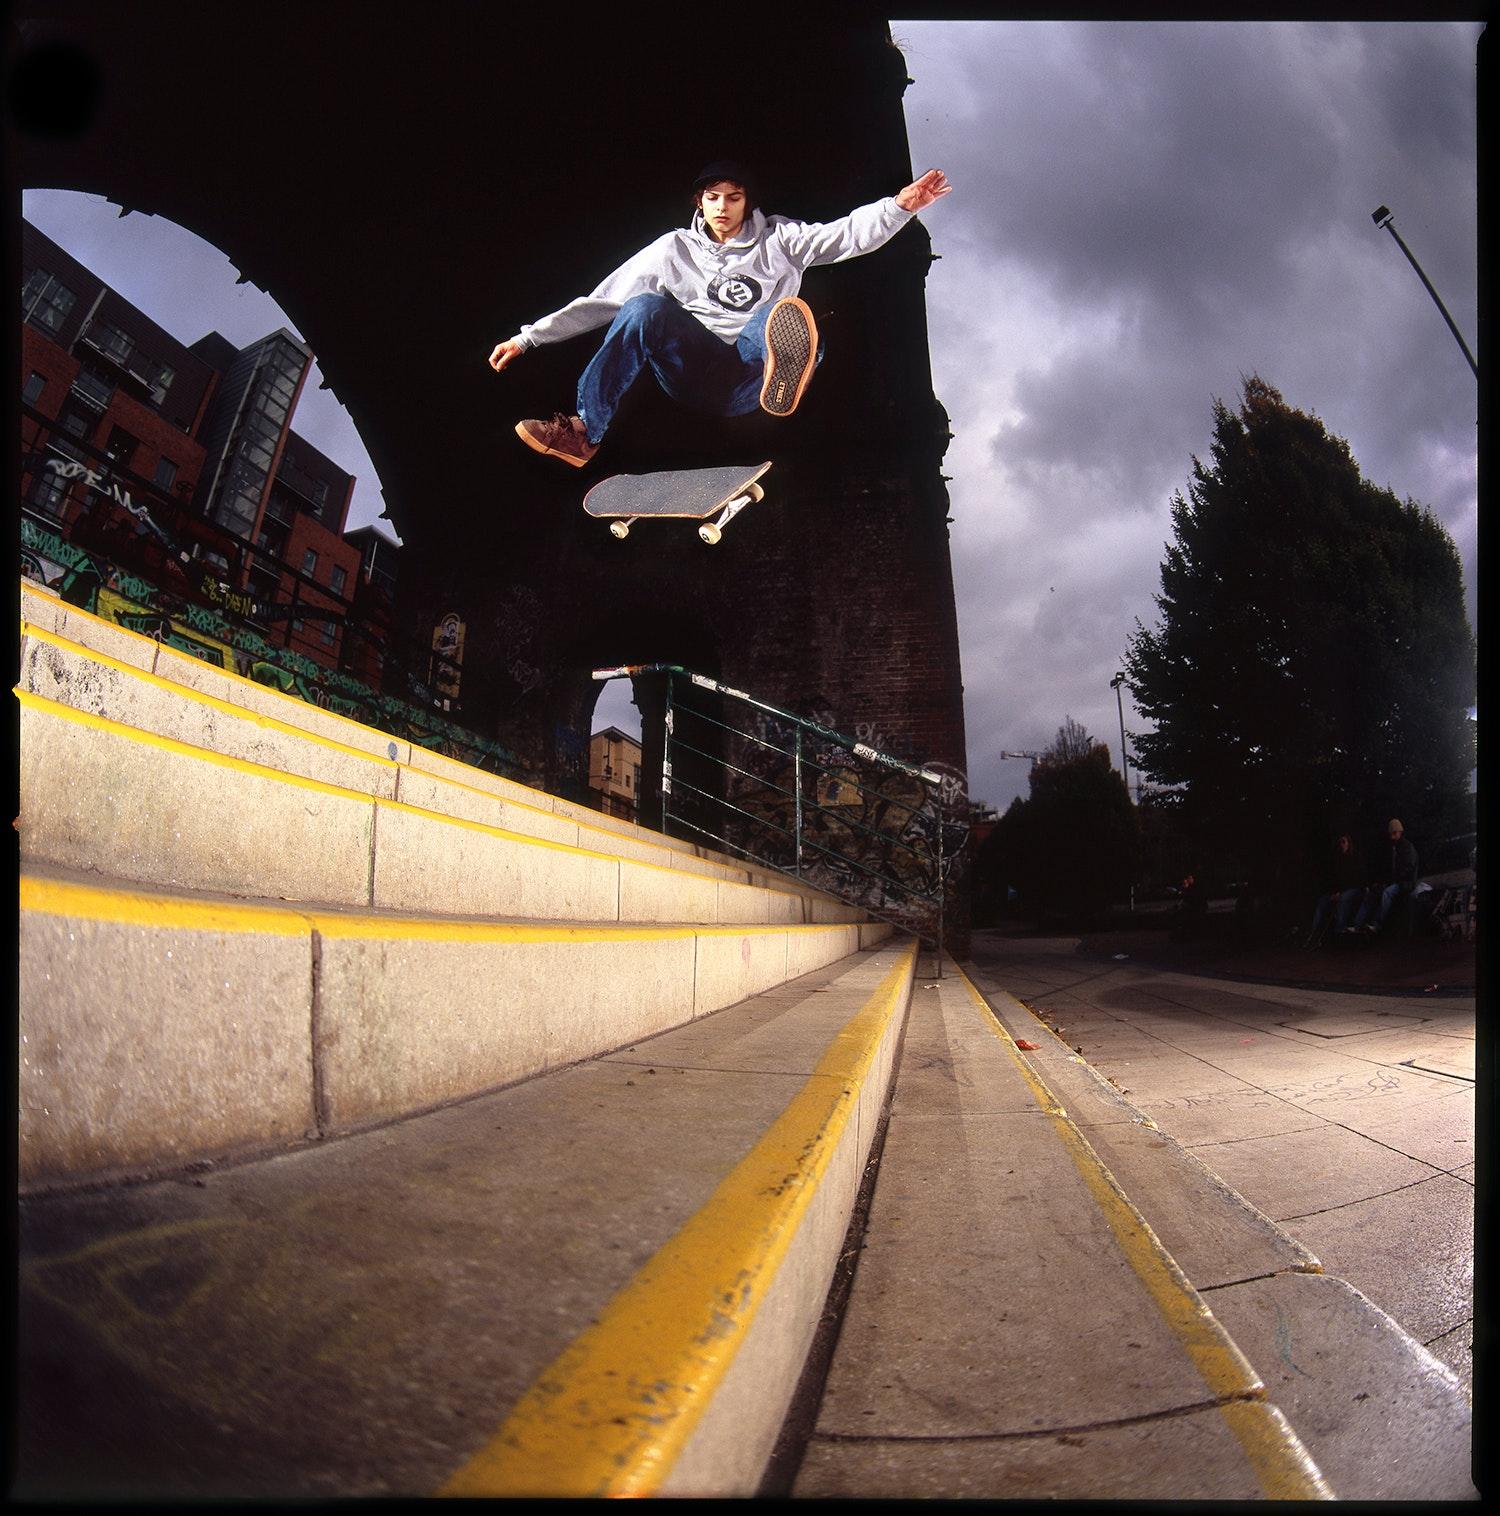 Skate Spots